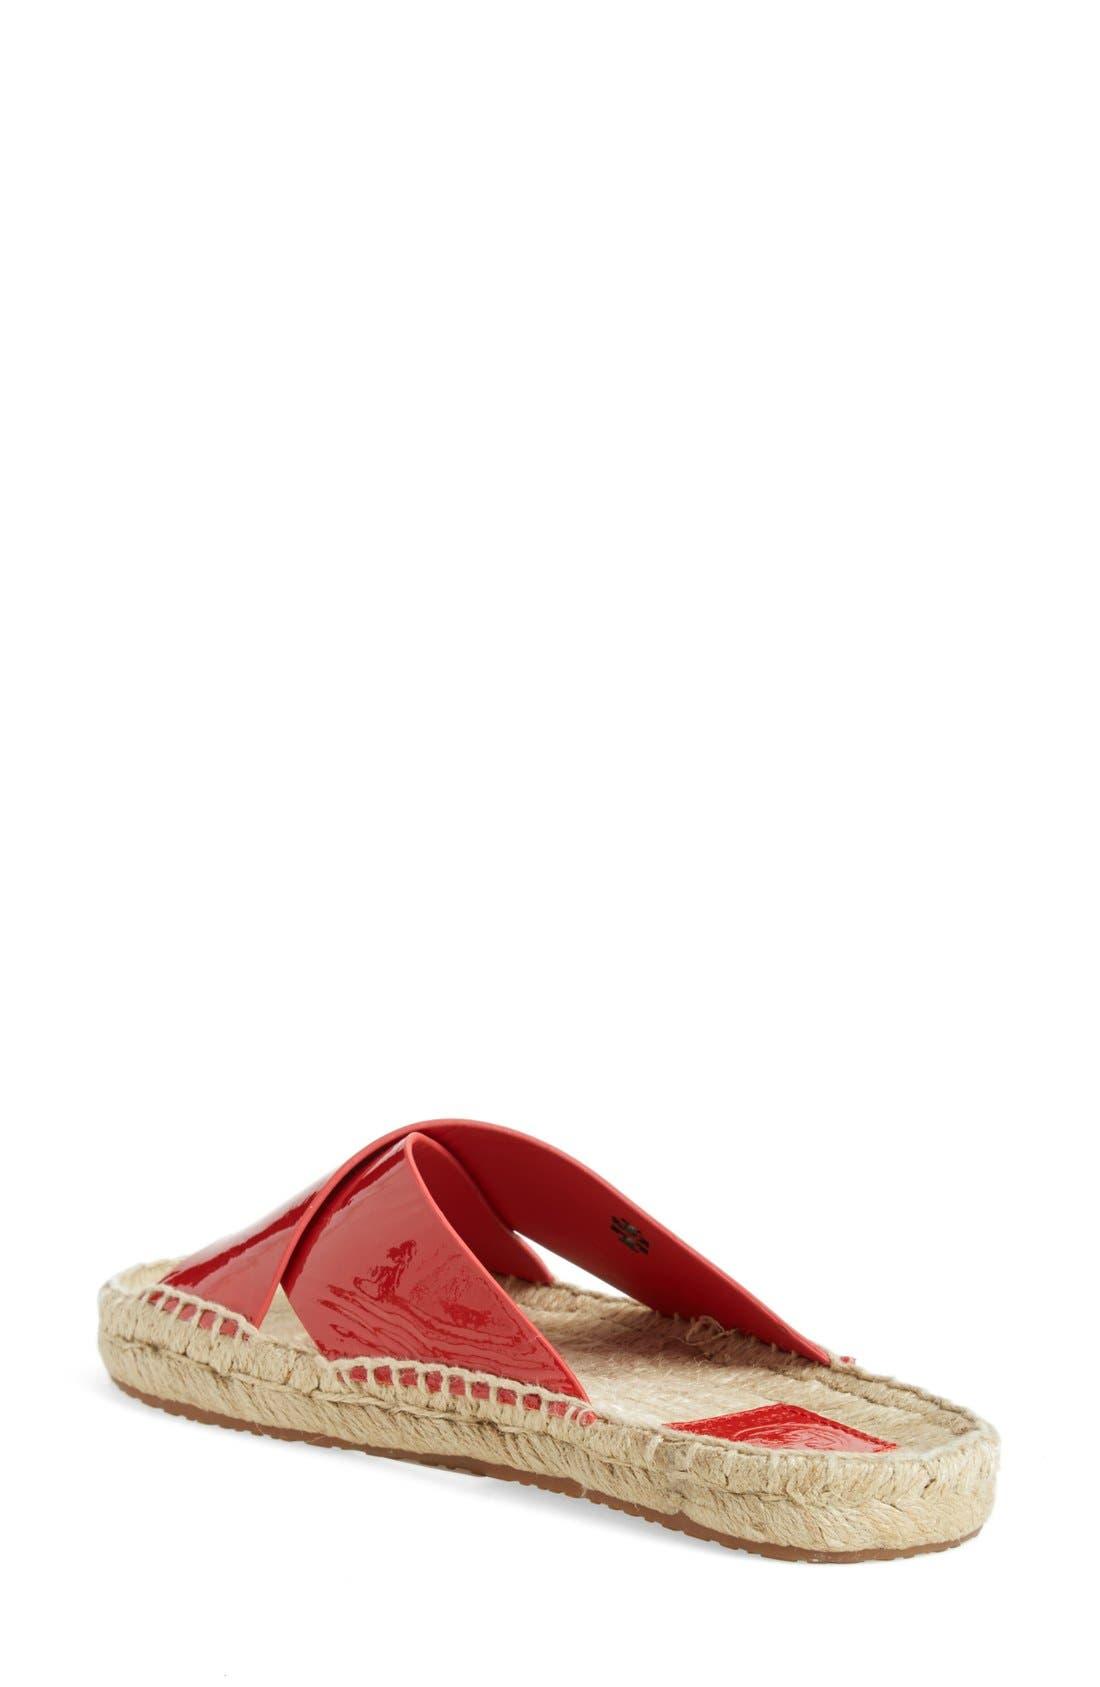 TORY BURCH,                             'Bima' Espadrille Slide Sandal,                             Alternate thumbnail 2, color,                             601